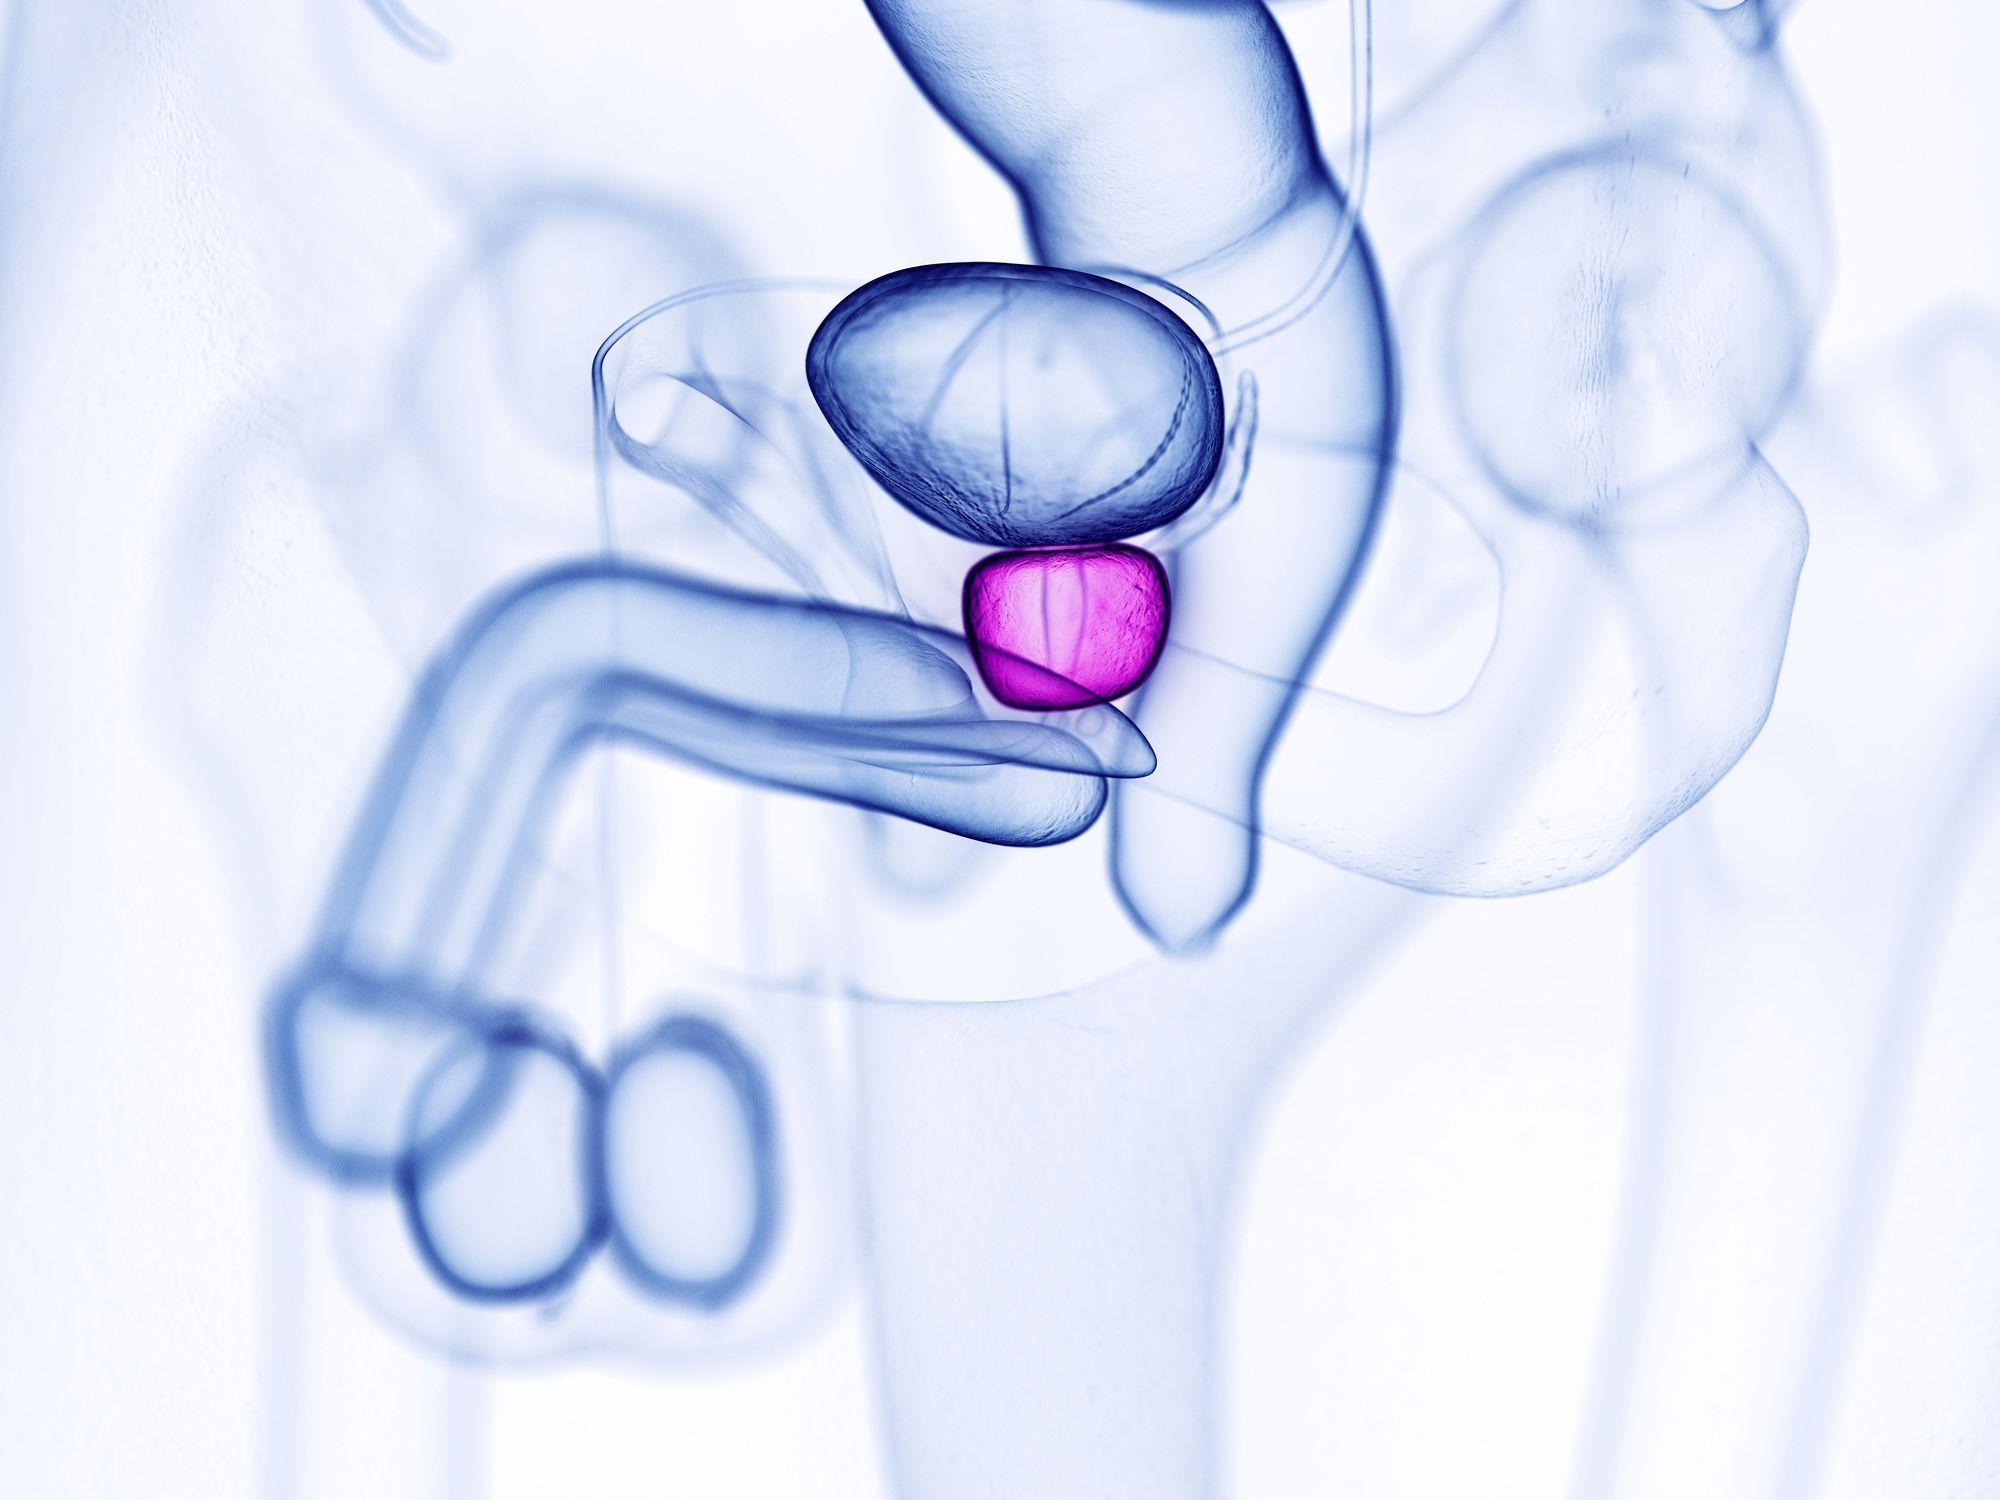 prostate exam nhs